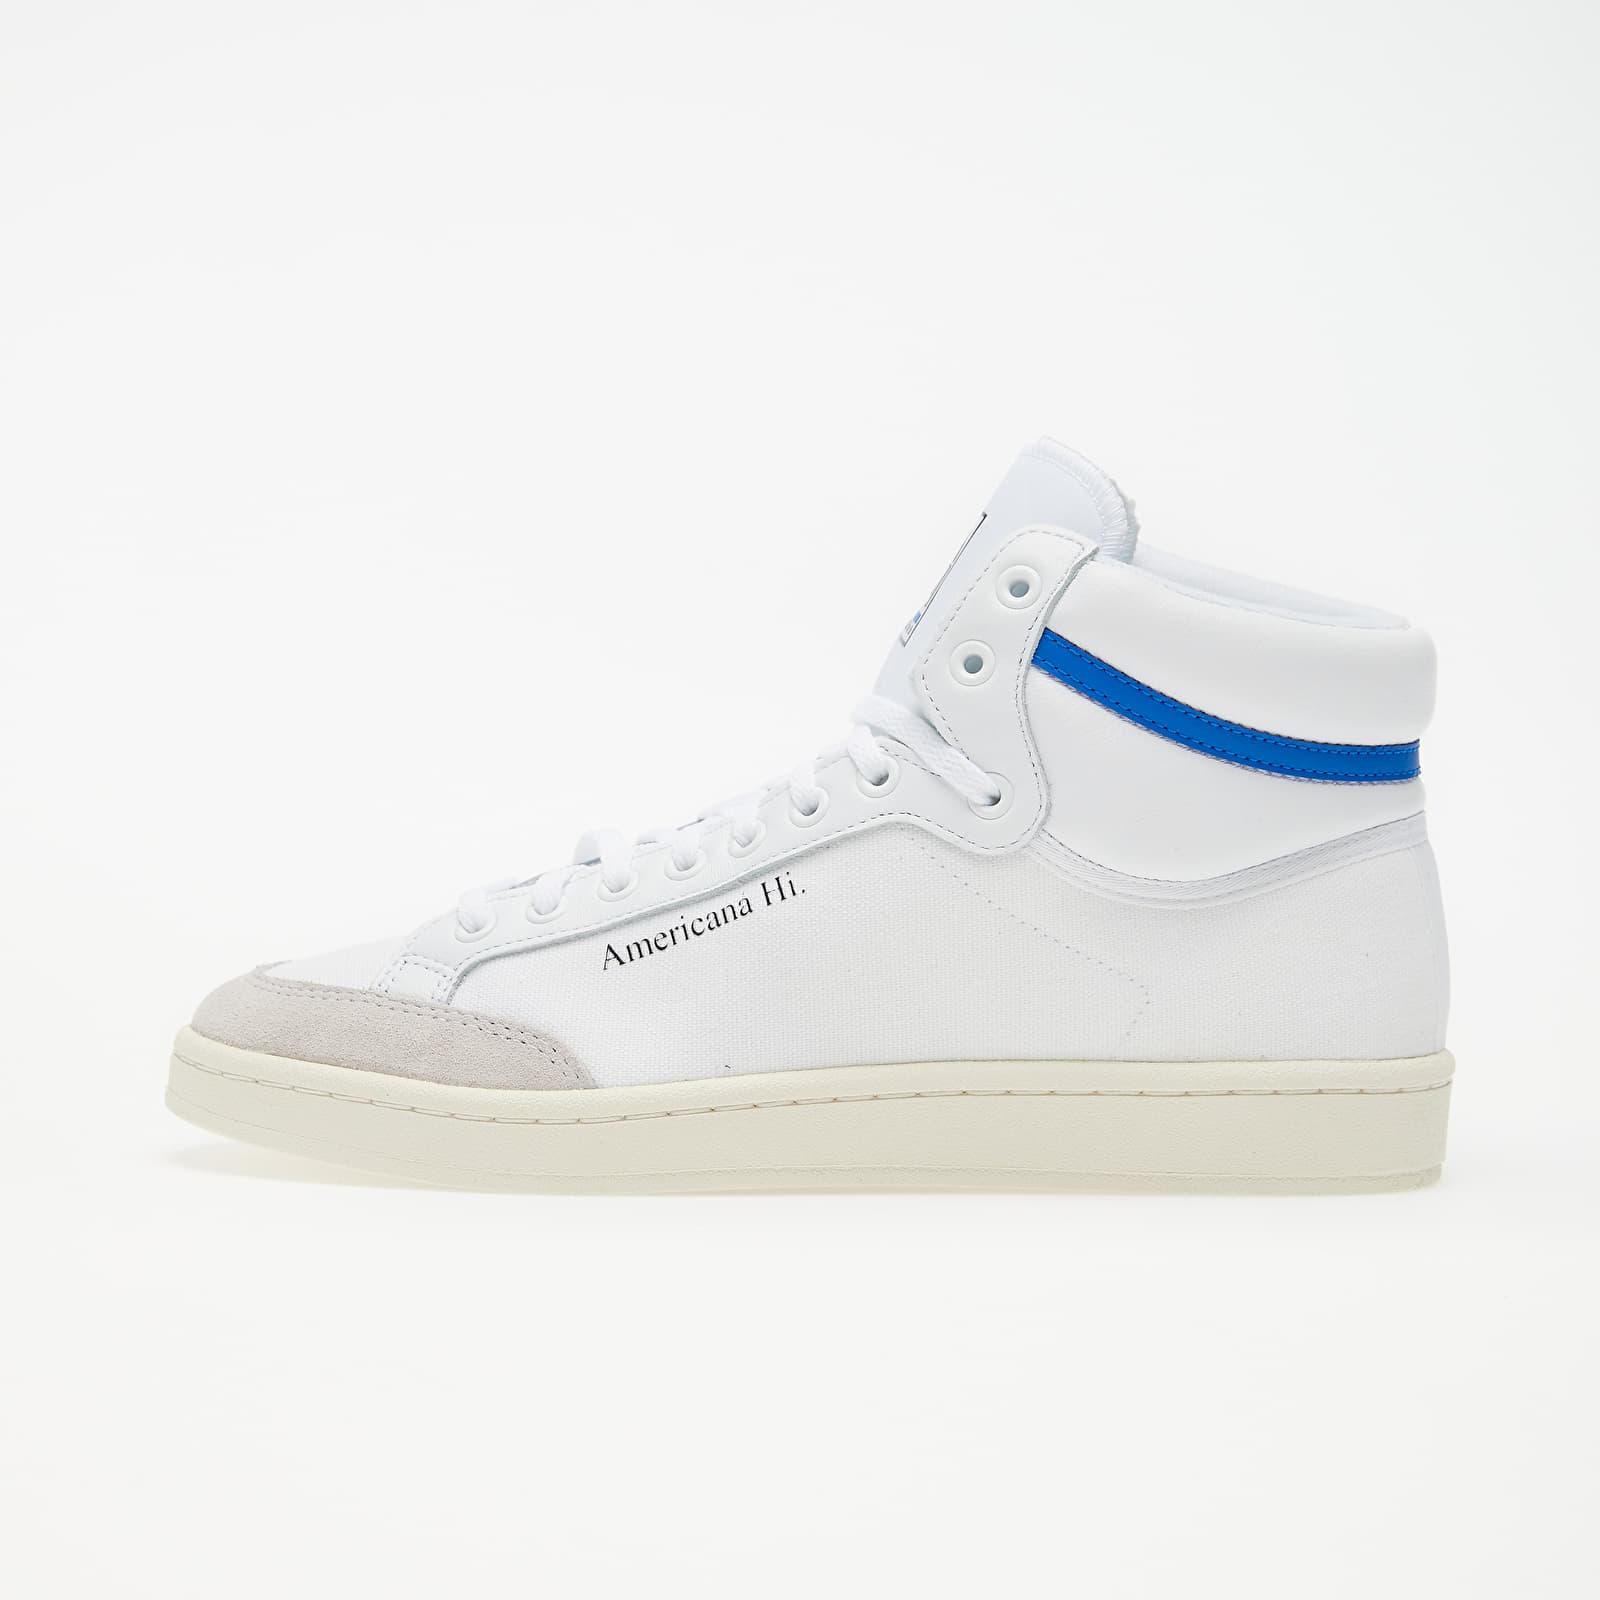 Férfi cipők adidas Americana Hi Ftw White/ Glow Blue/ Core Black